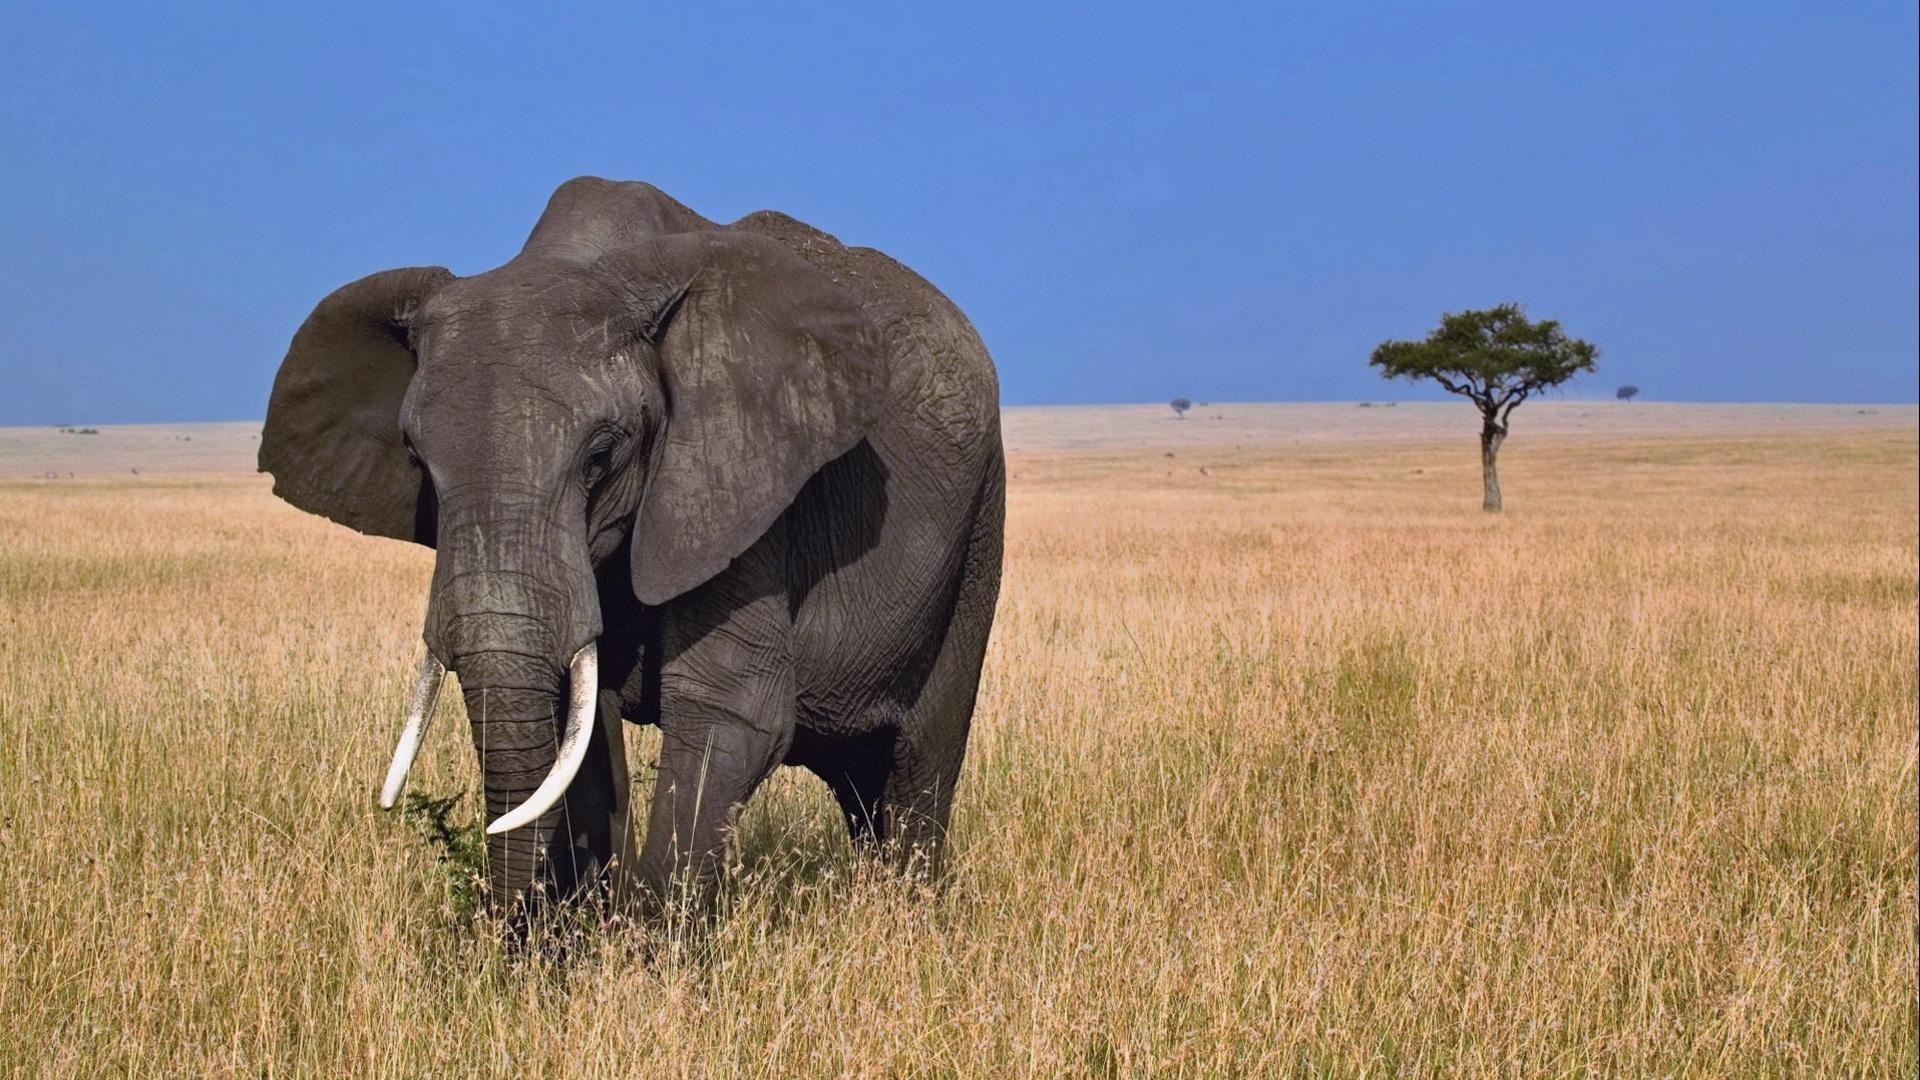 47 Animals Elephant Wallpaper Free Download On Wallpapersafari